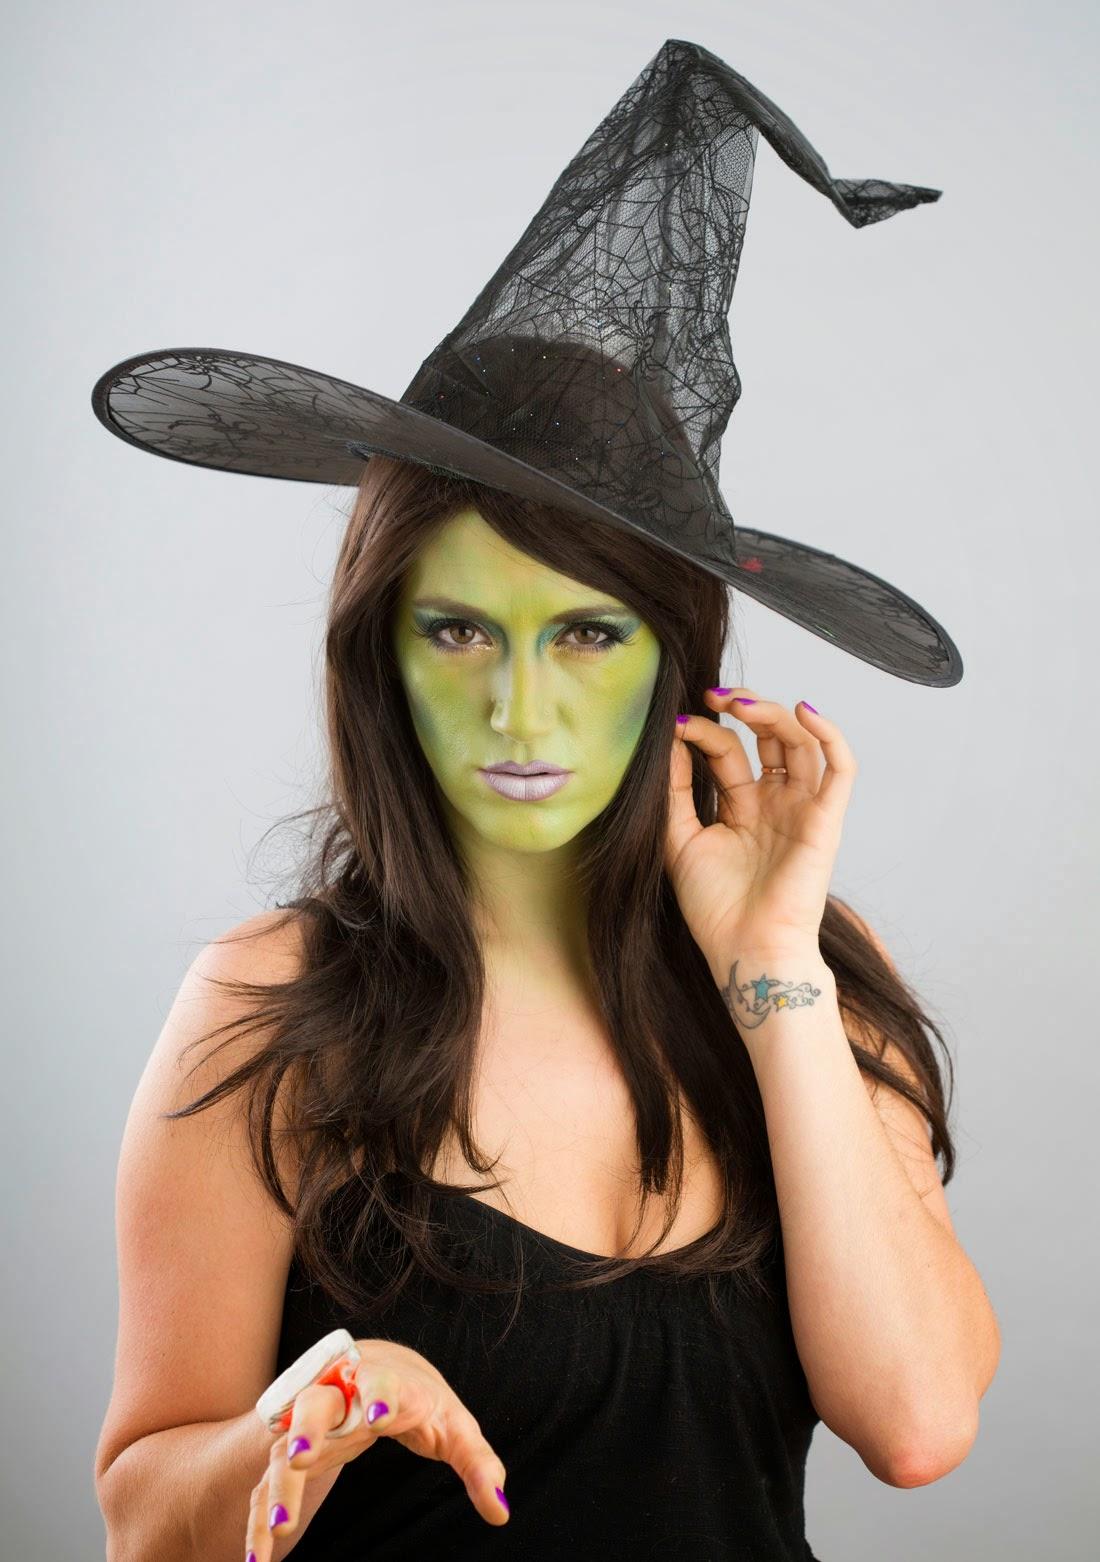 MuyVariadocom Caras Pintadas Maquillaje de Halloween Diseo Bruja